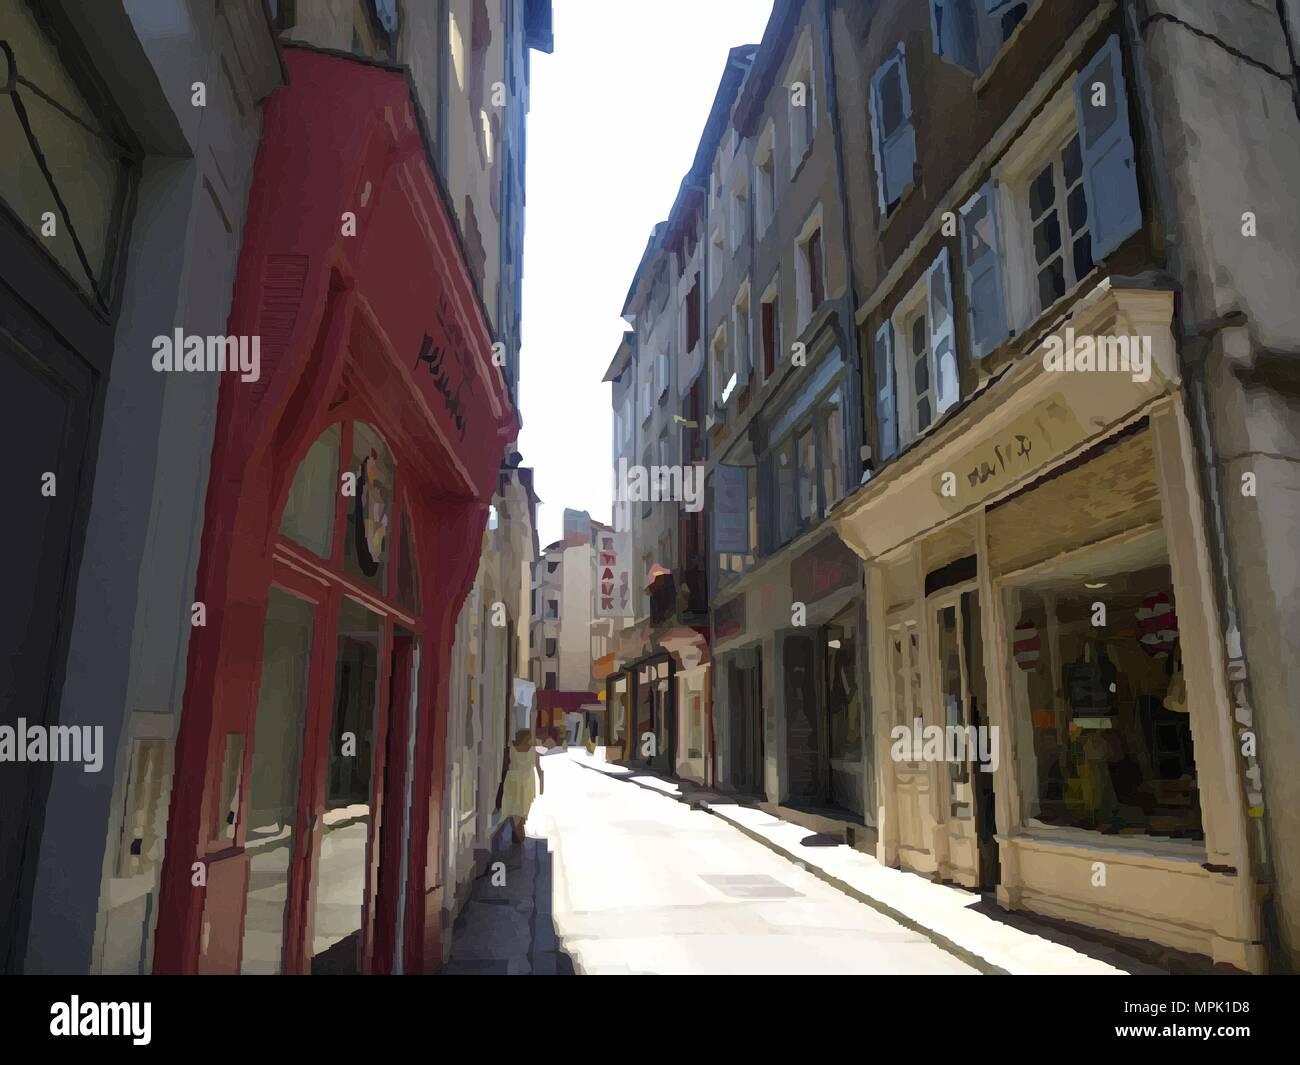 Side Street in Limoges, France. - Stock Image